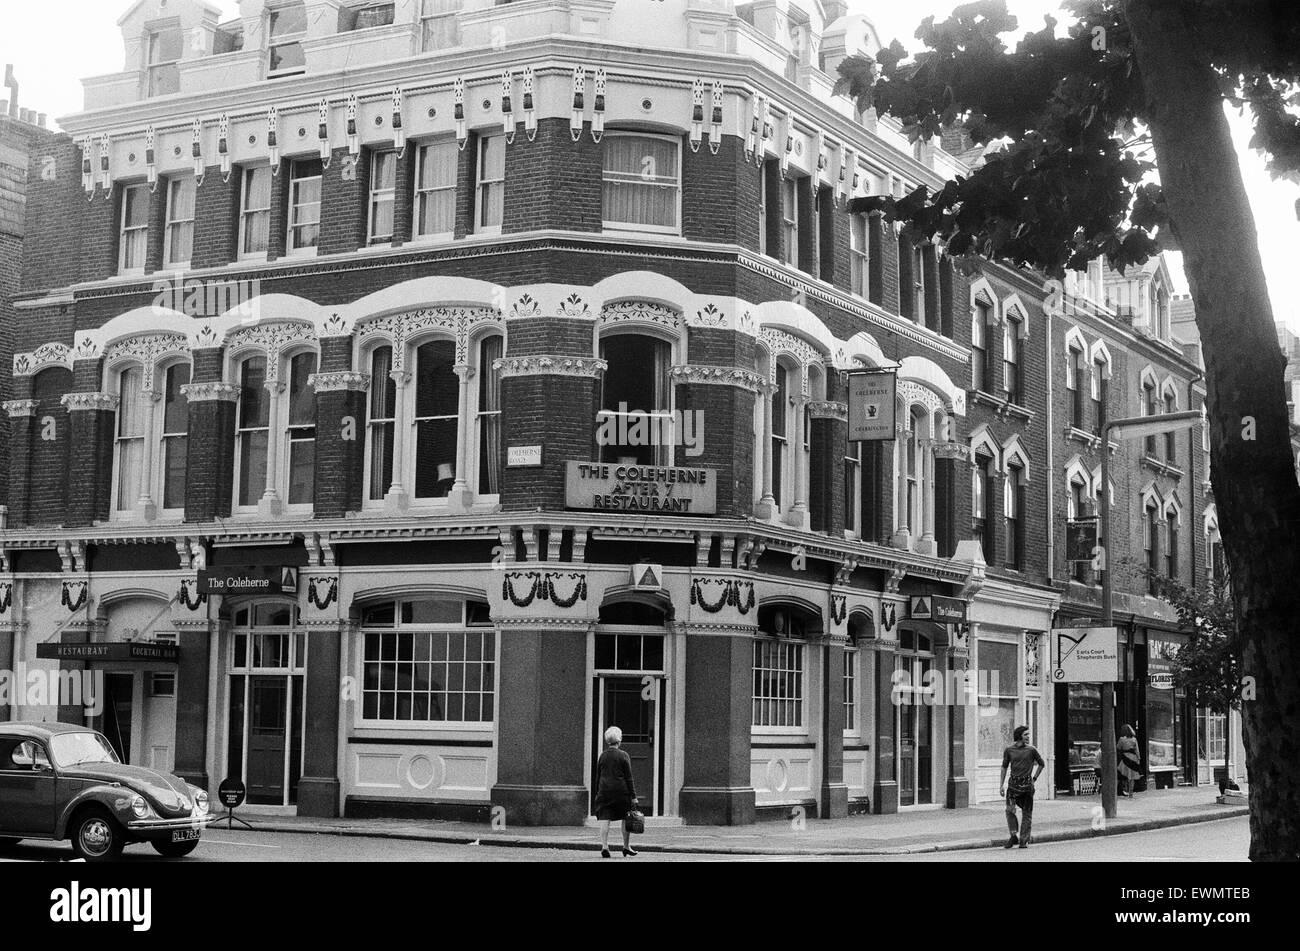 The Coleherne After 7 Restaurant, Coleherne Road, Earls Court, London, SW7, 11th September 1971. - Stock Image